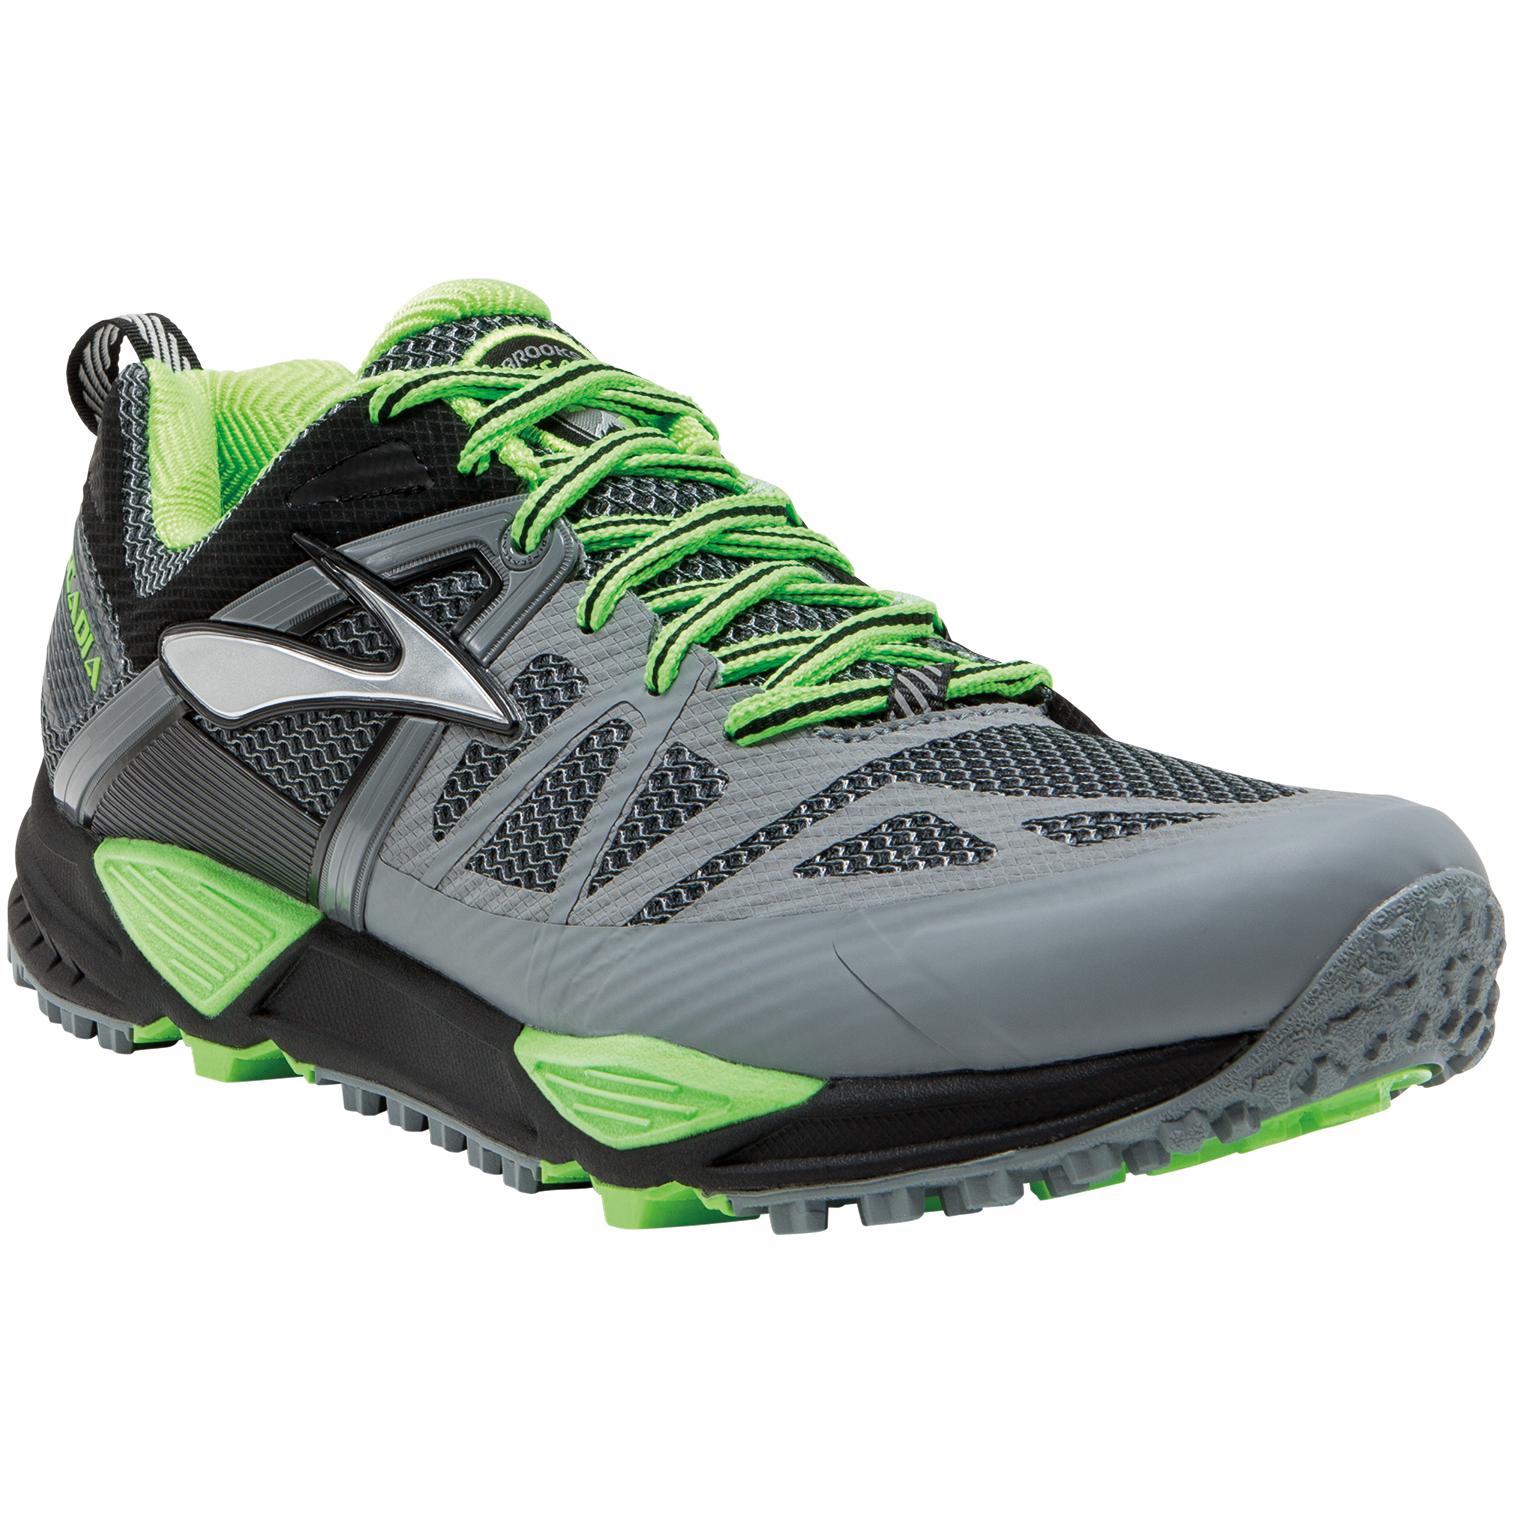 82514a17cdb6d Brooks Cascadia 10 Trail Running Shoes - Men s